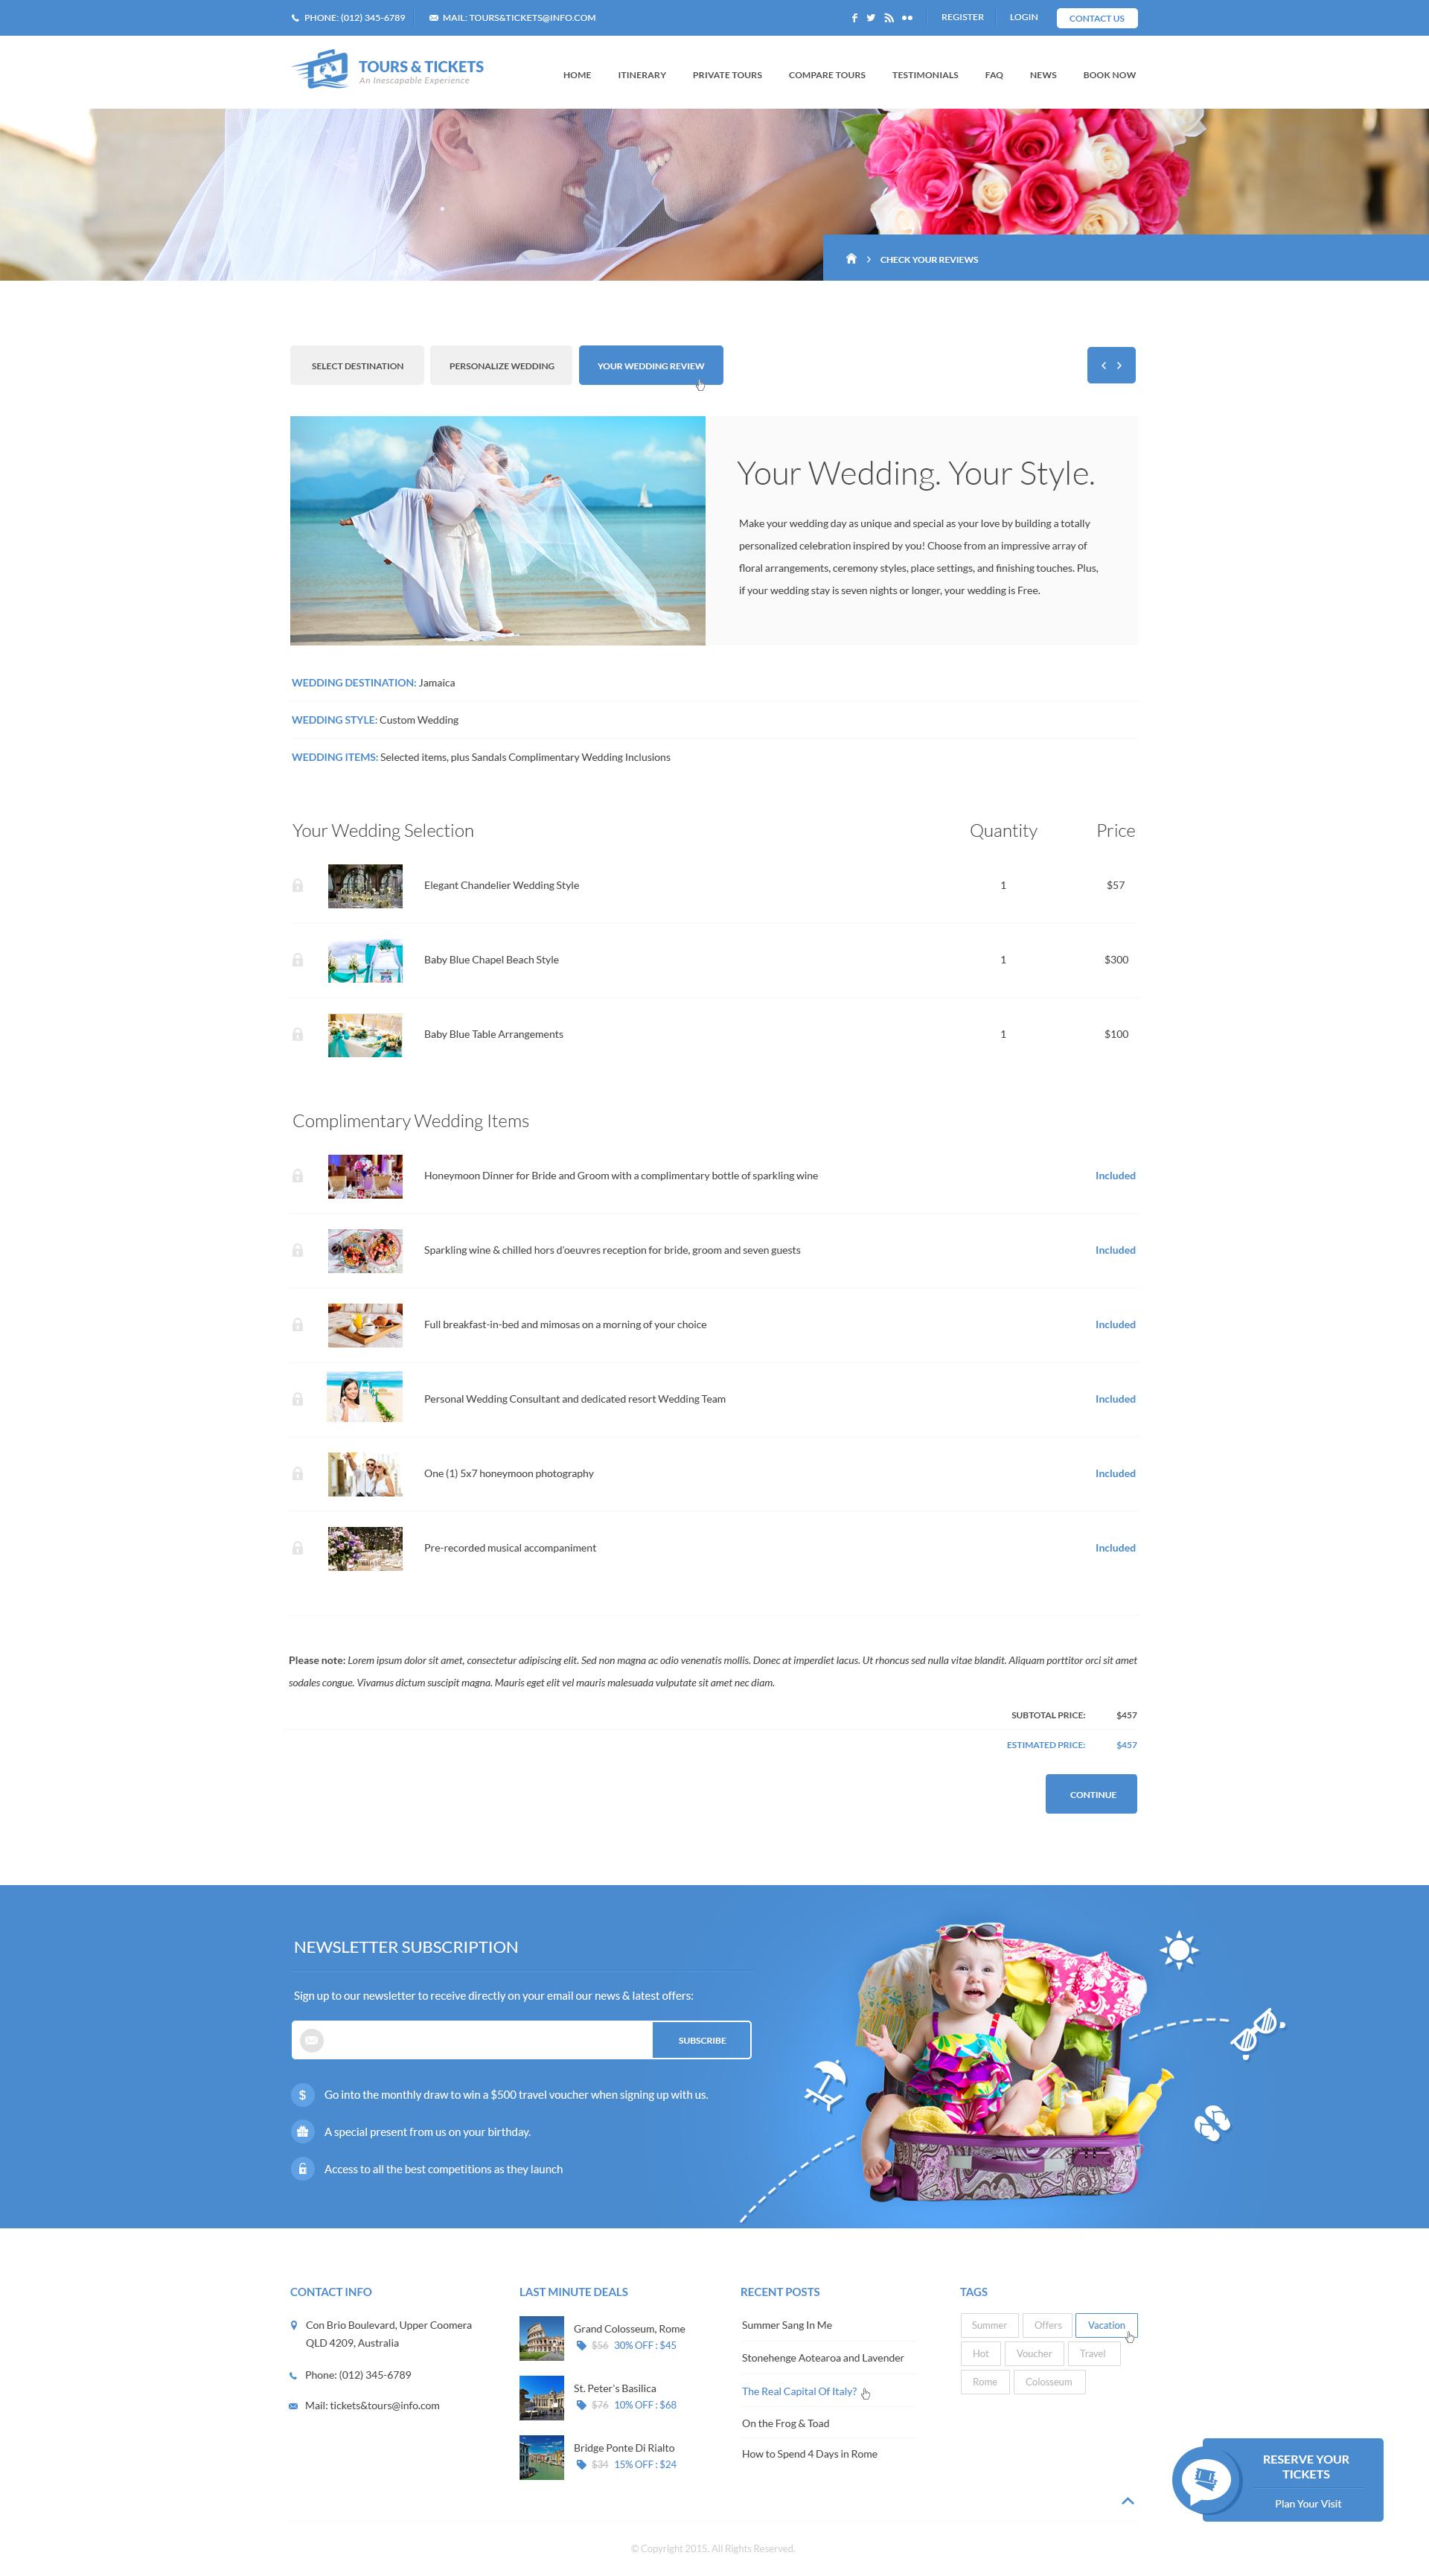 Ms Access Html Template Gallery - Template Design Ideas